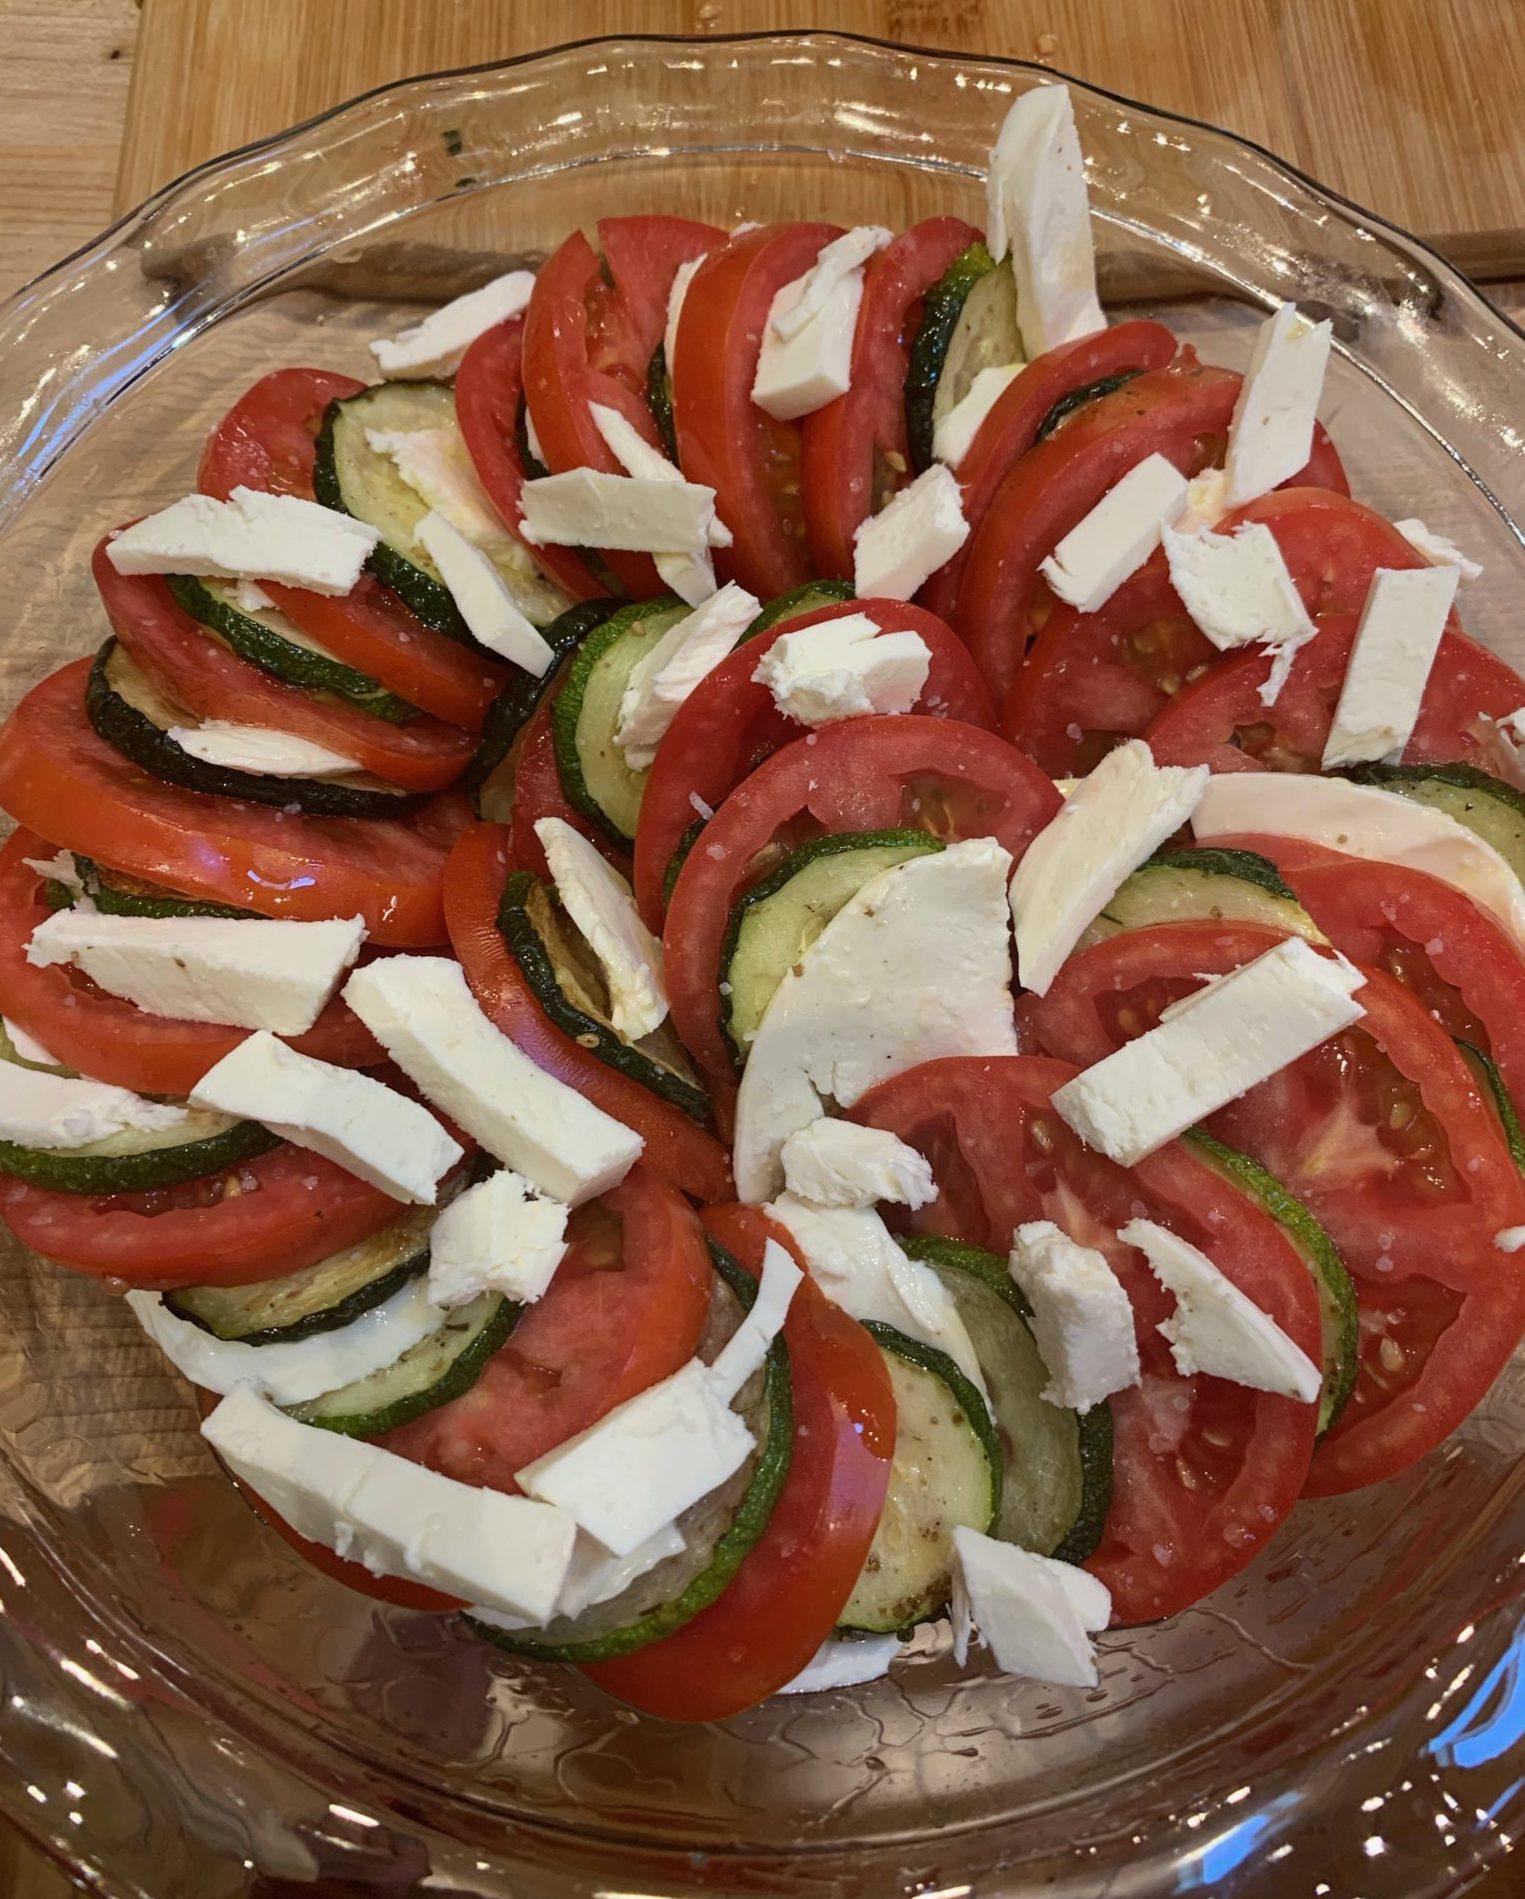 Slices of zucchini, tomato and mozzarella are layers in a glass pie plate before baking